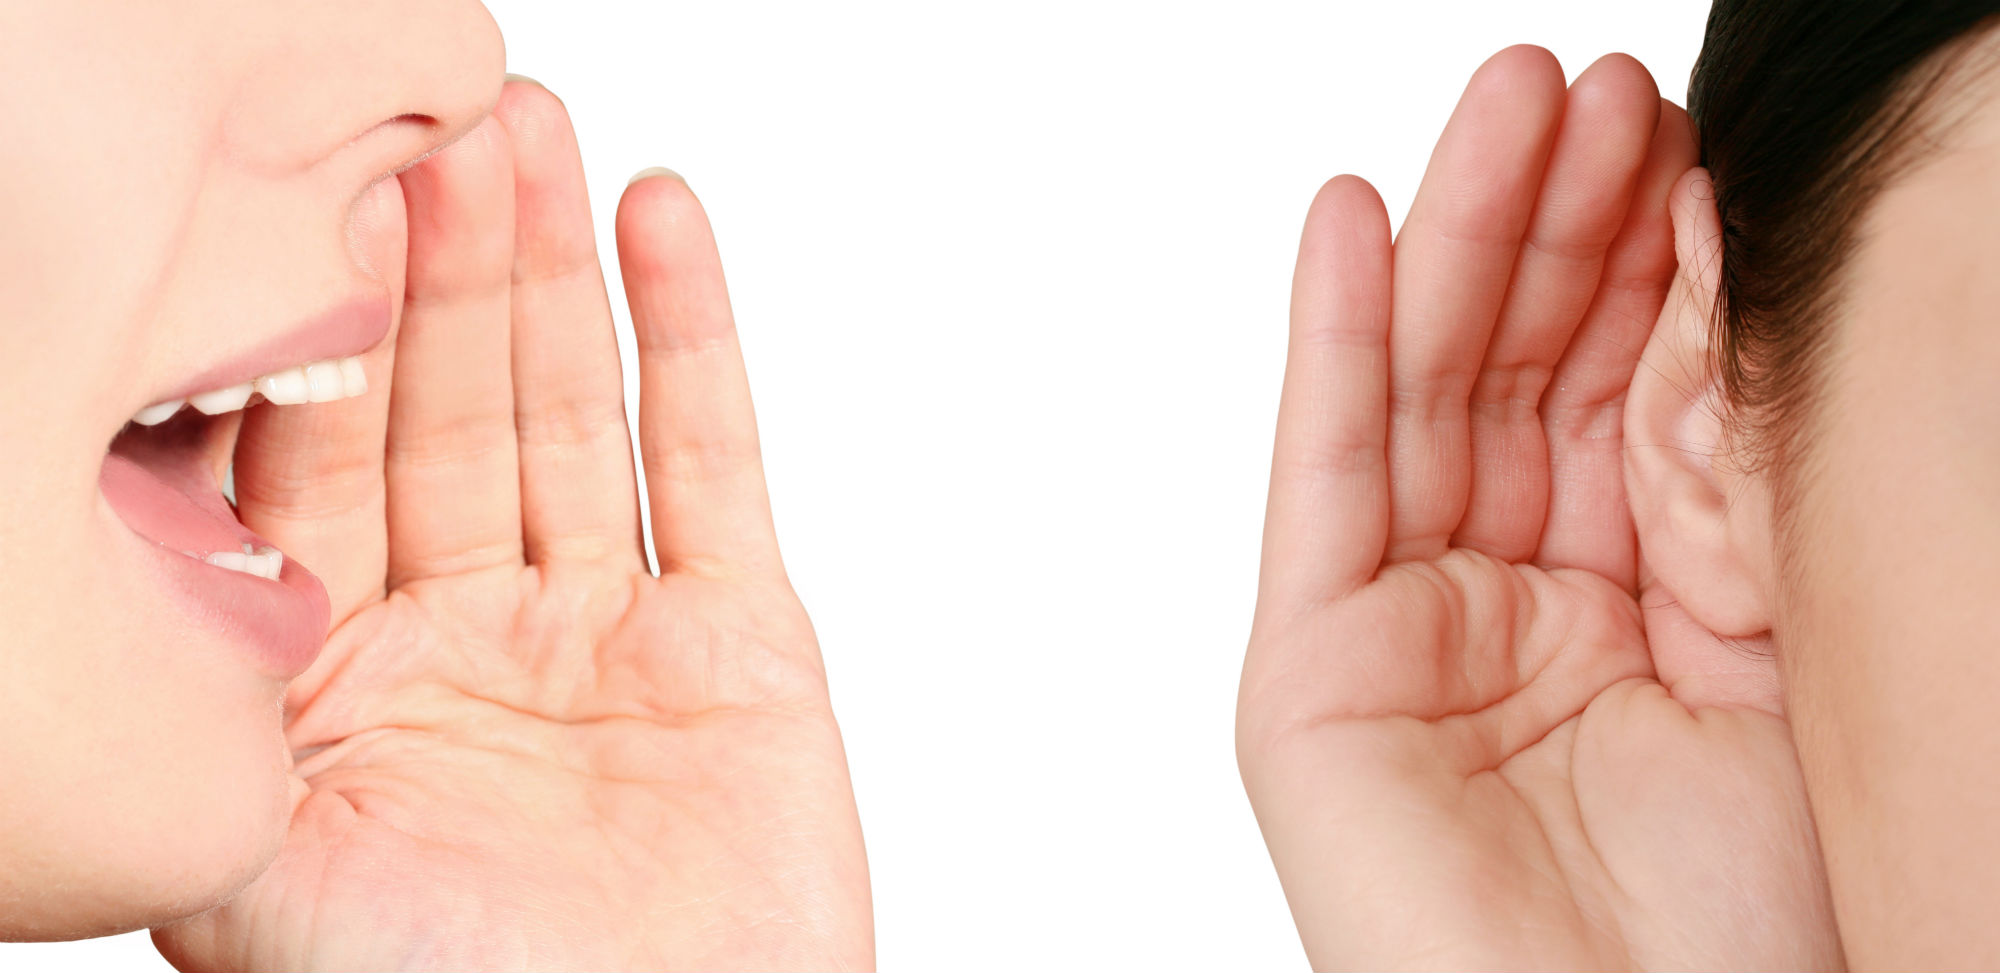 todos-podem-ter-perda-auditiva